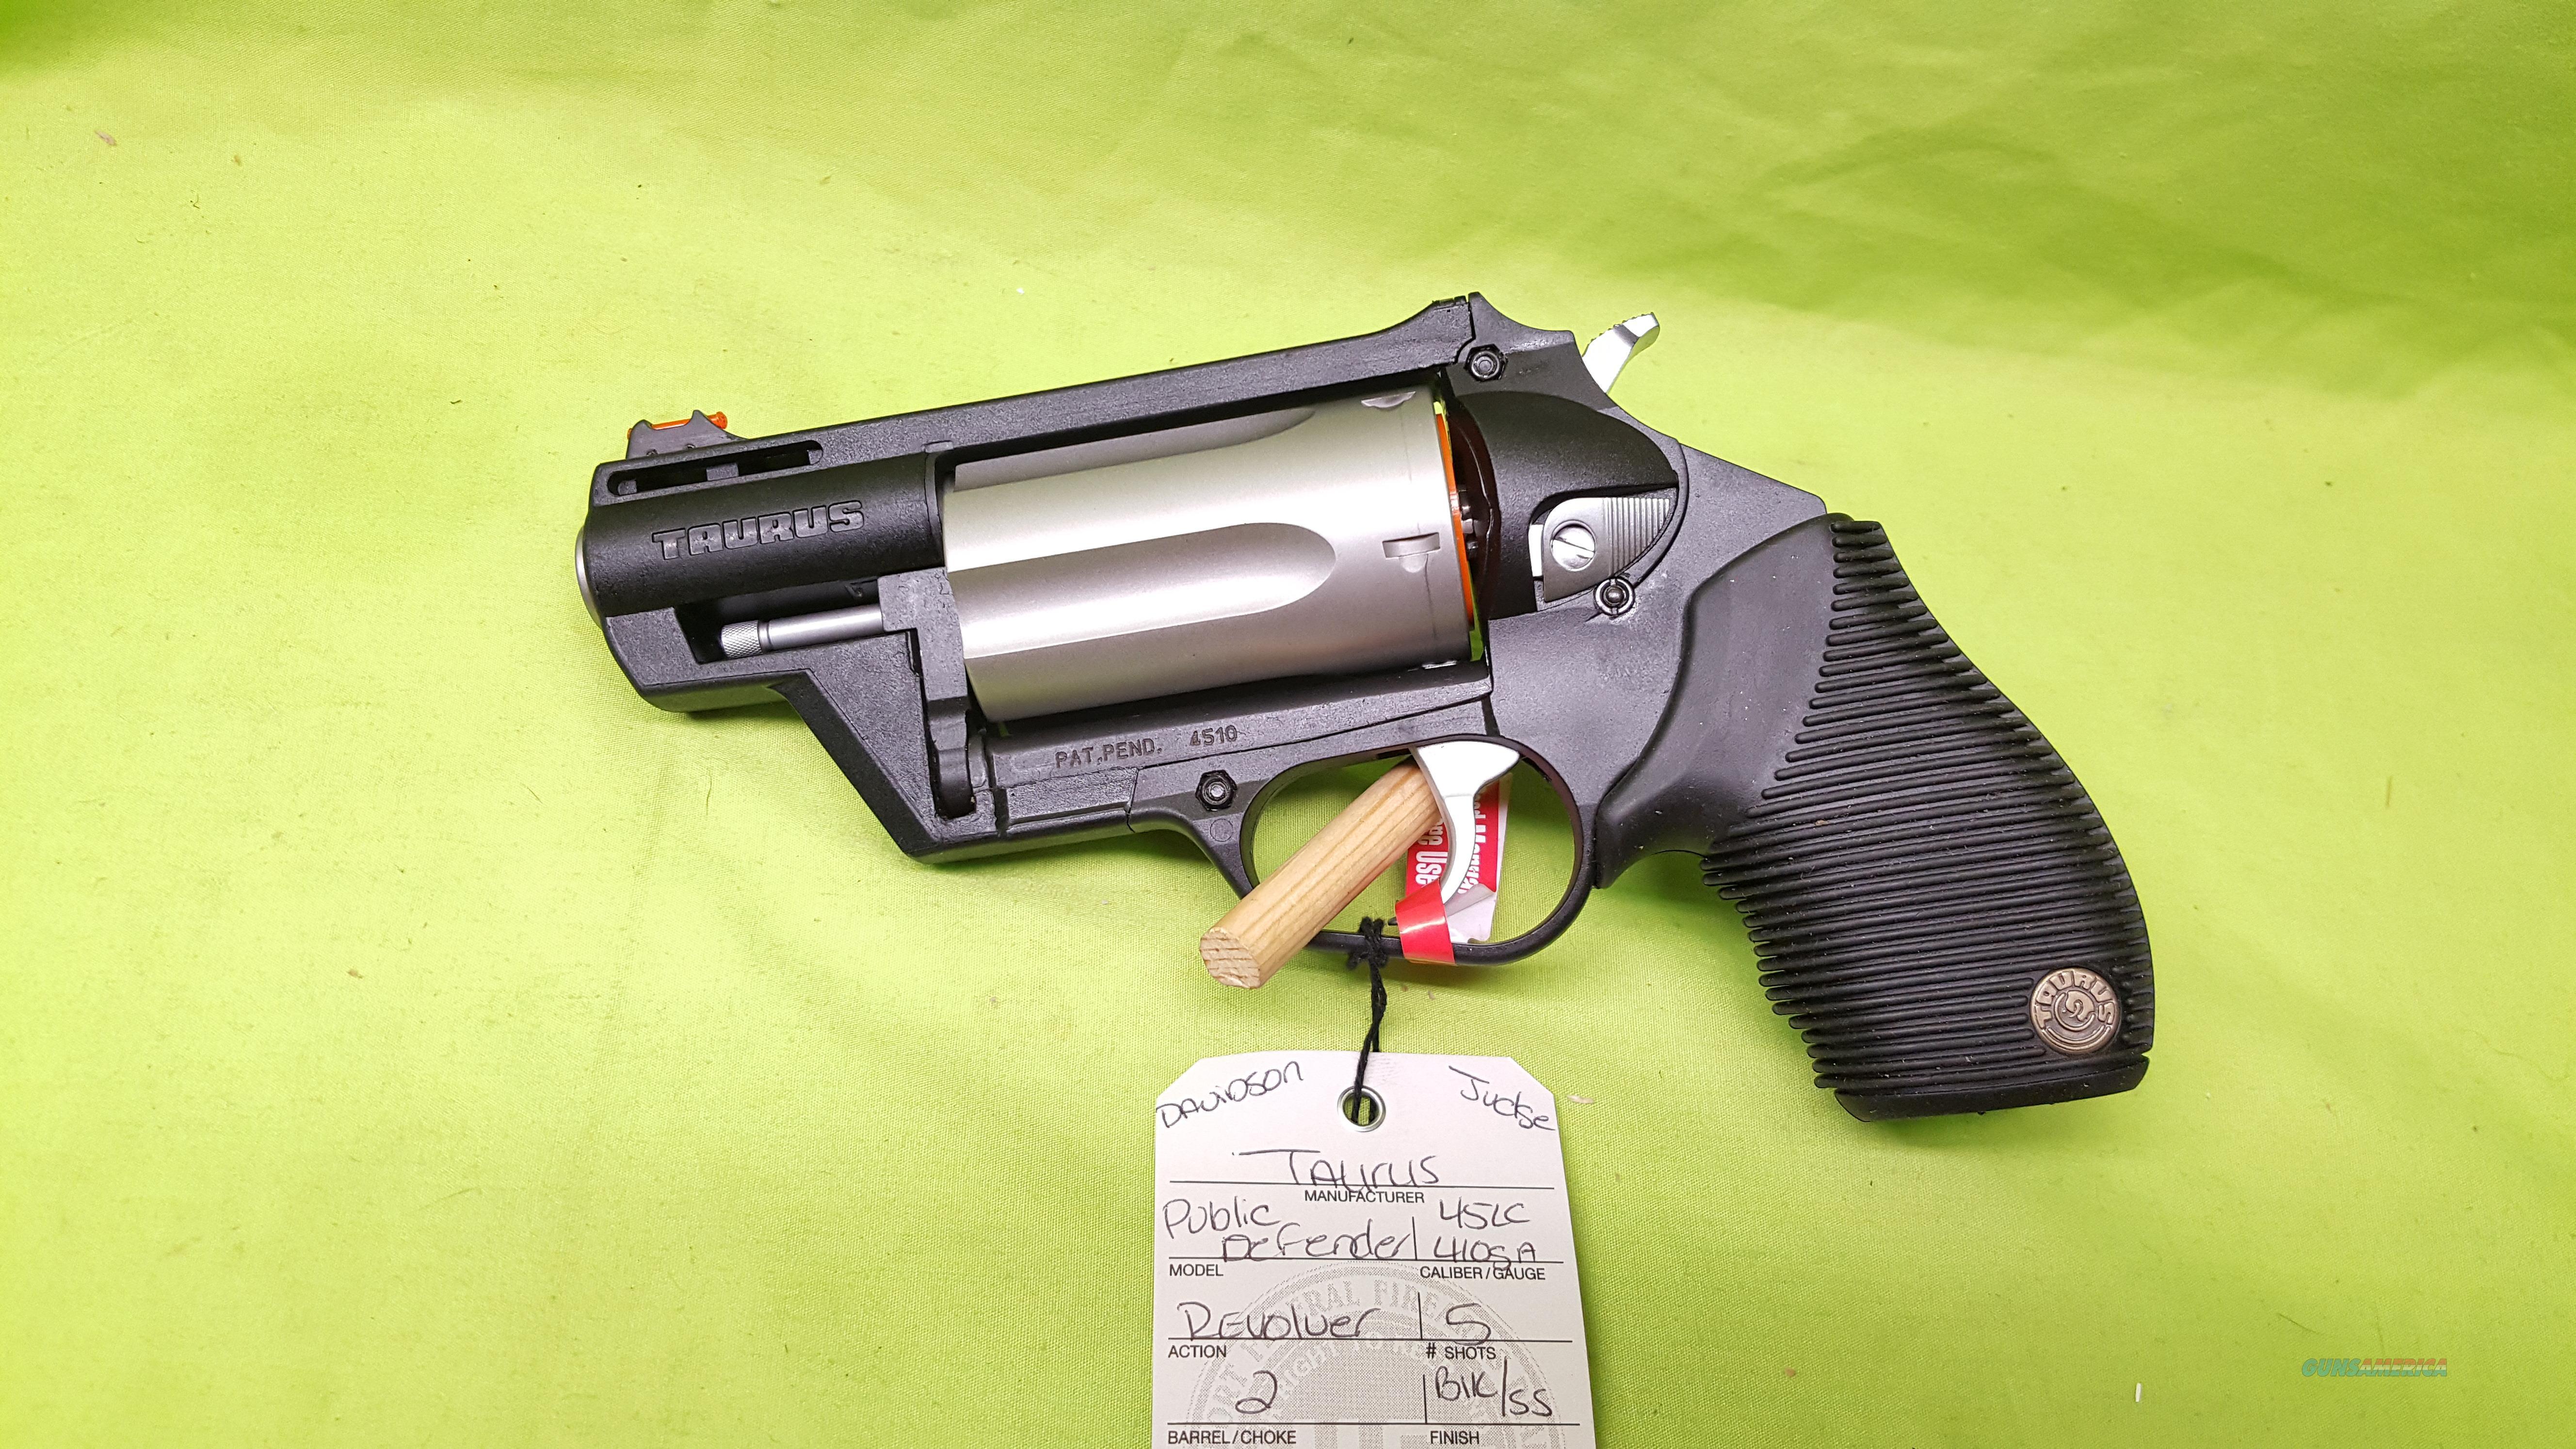 "TAURUS PUBLIC DEFENDER JUDGE 45 LC 410 GA SS 2"" POLY  Guns > Pistols > Taurus Pistols > Revolvers"